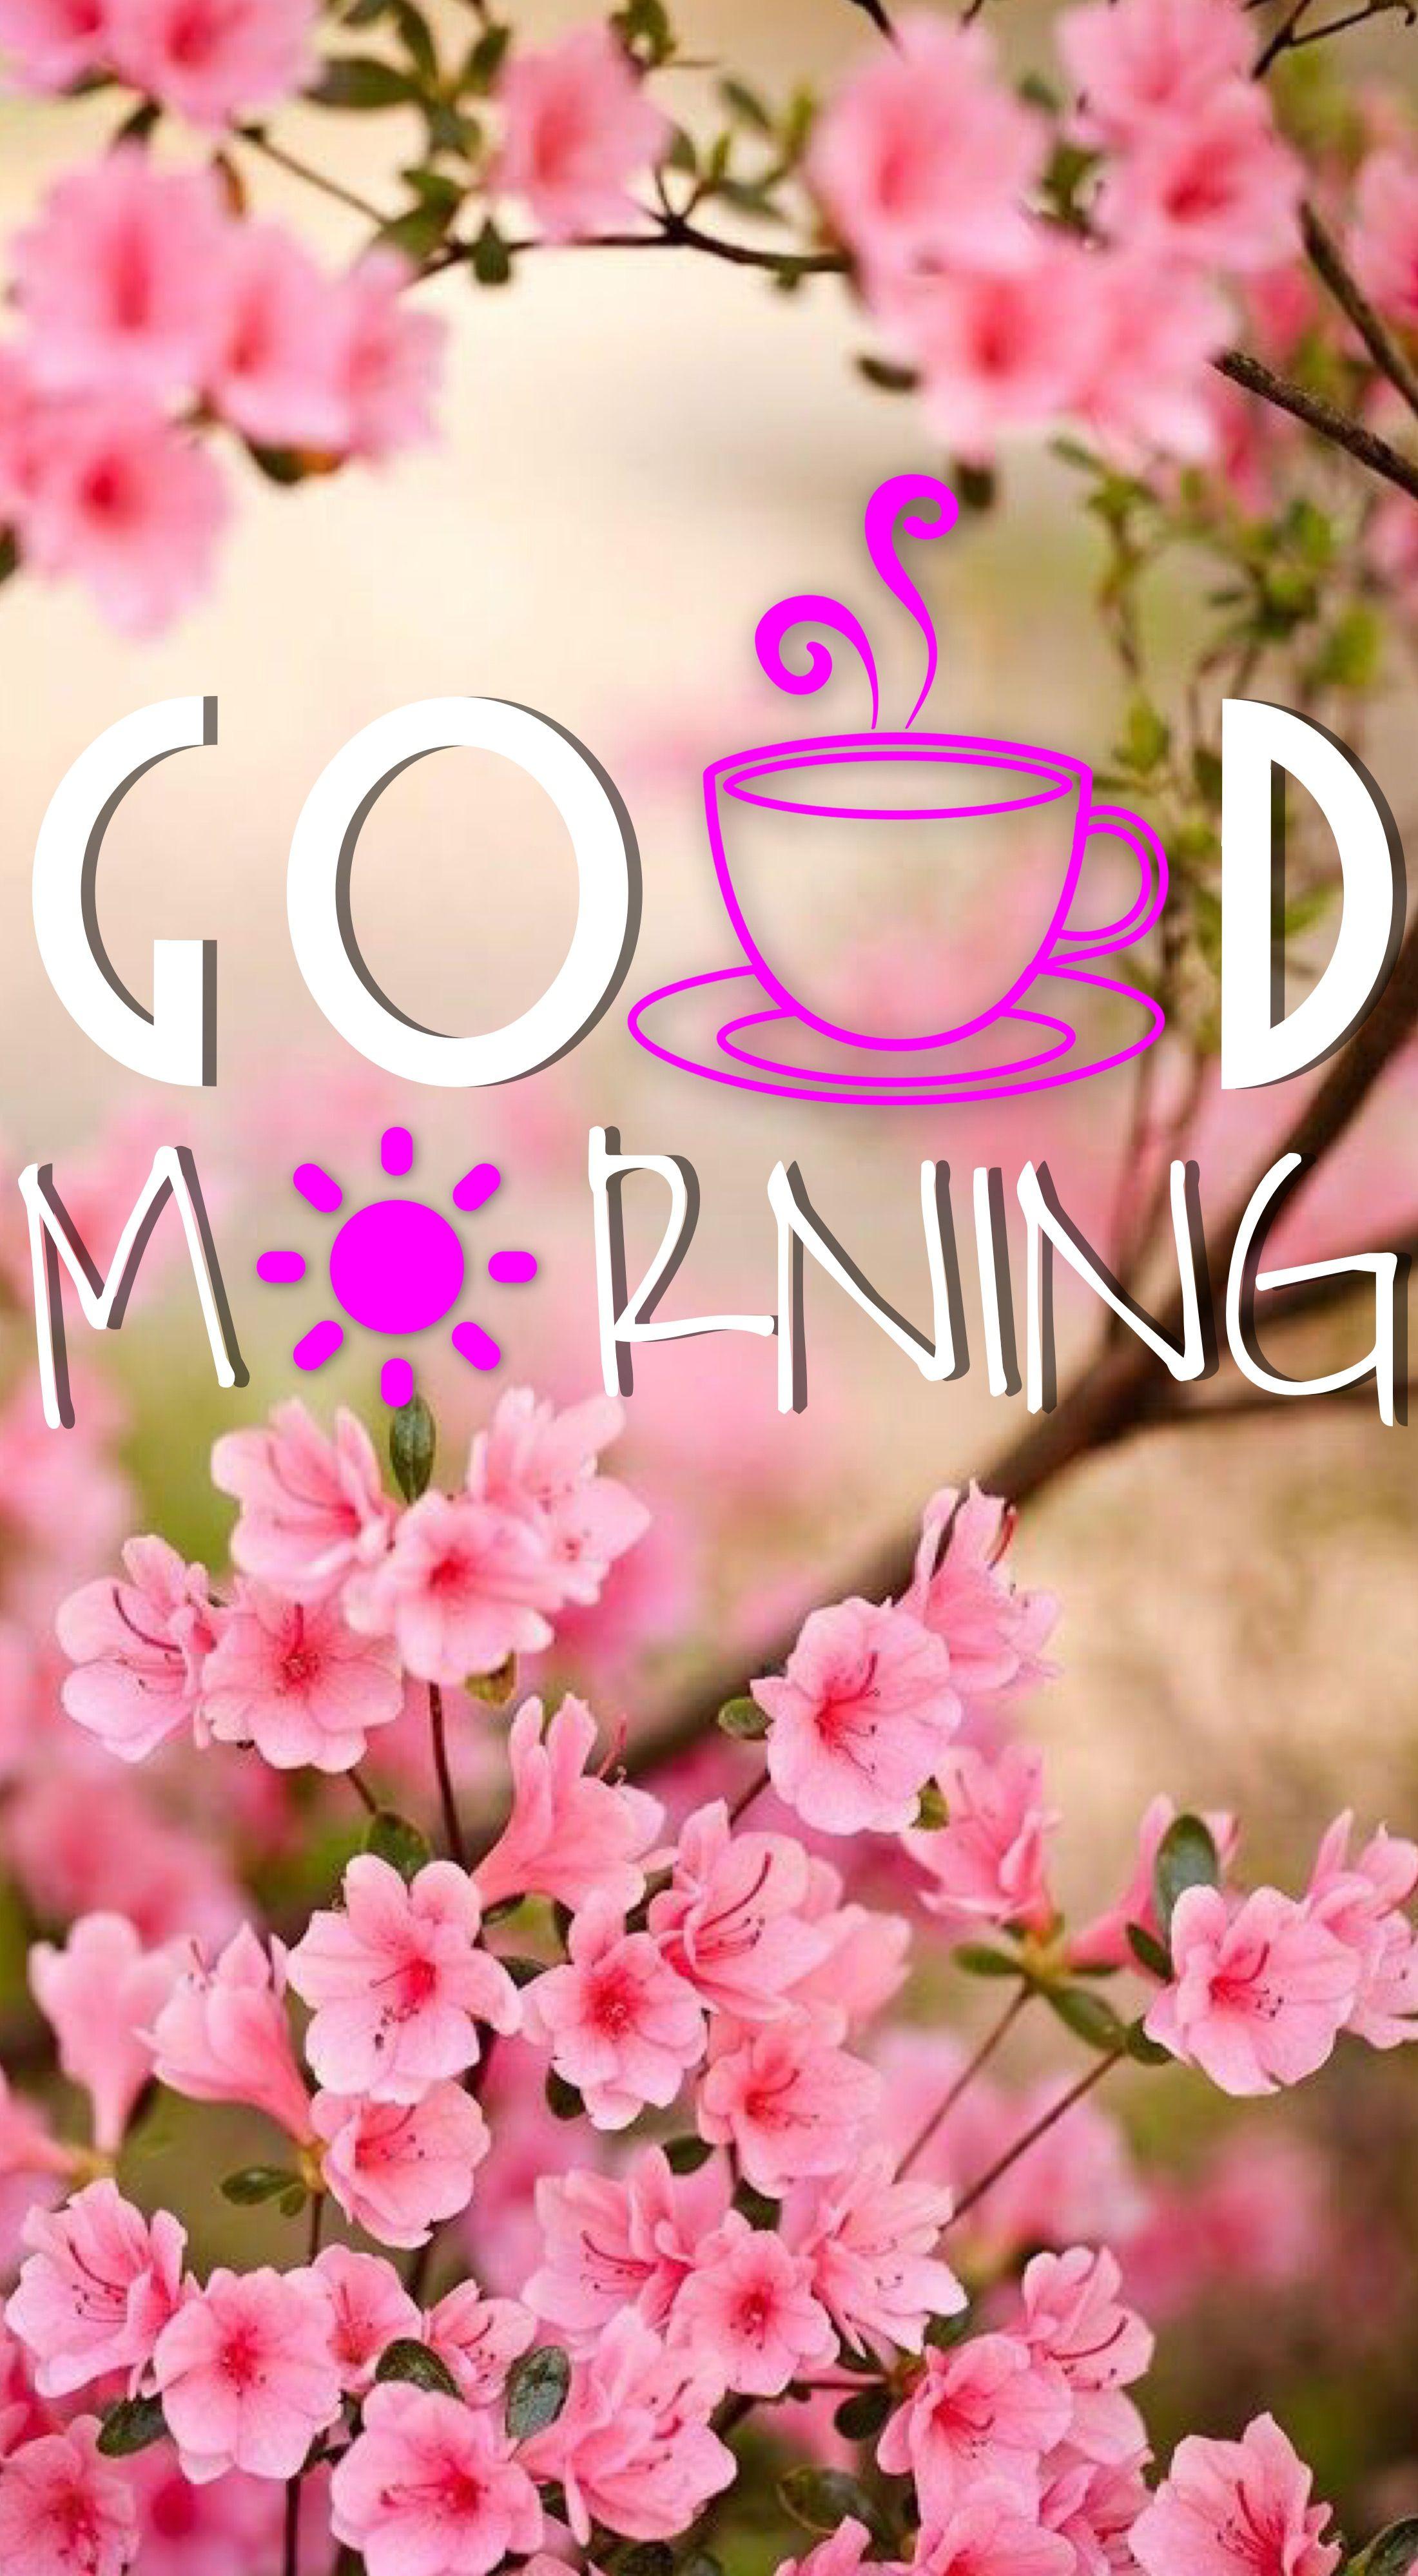 Pin By Ciella Yearwood On Hello Pinterest Morning Greetings